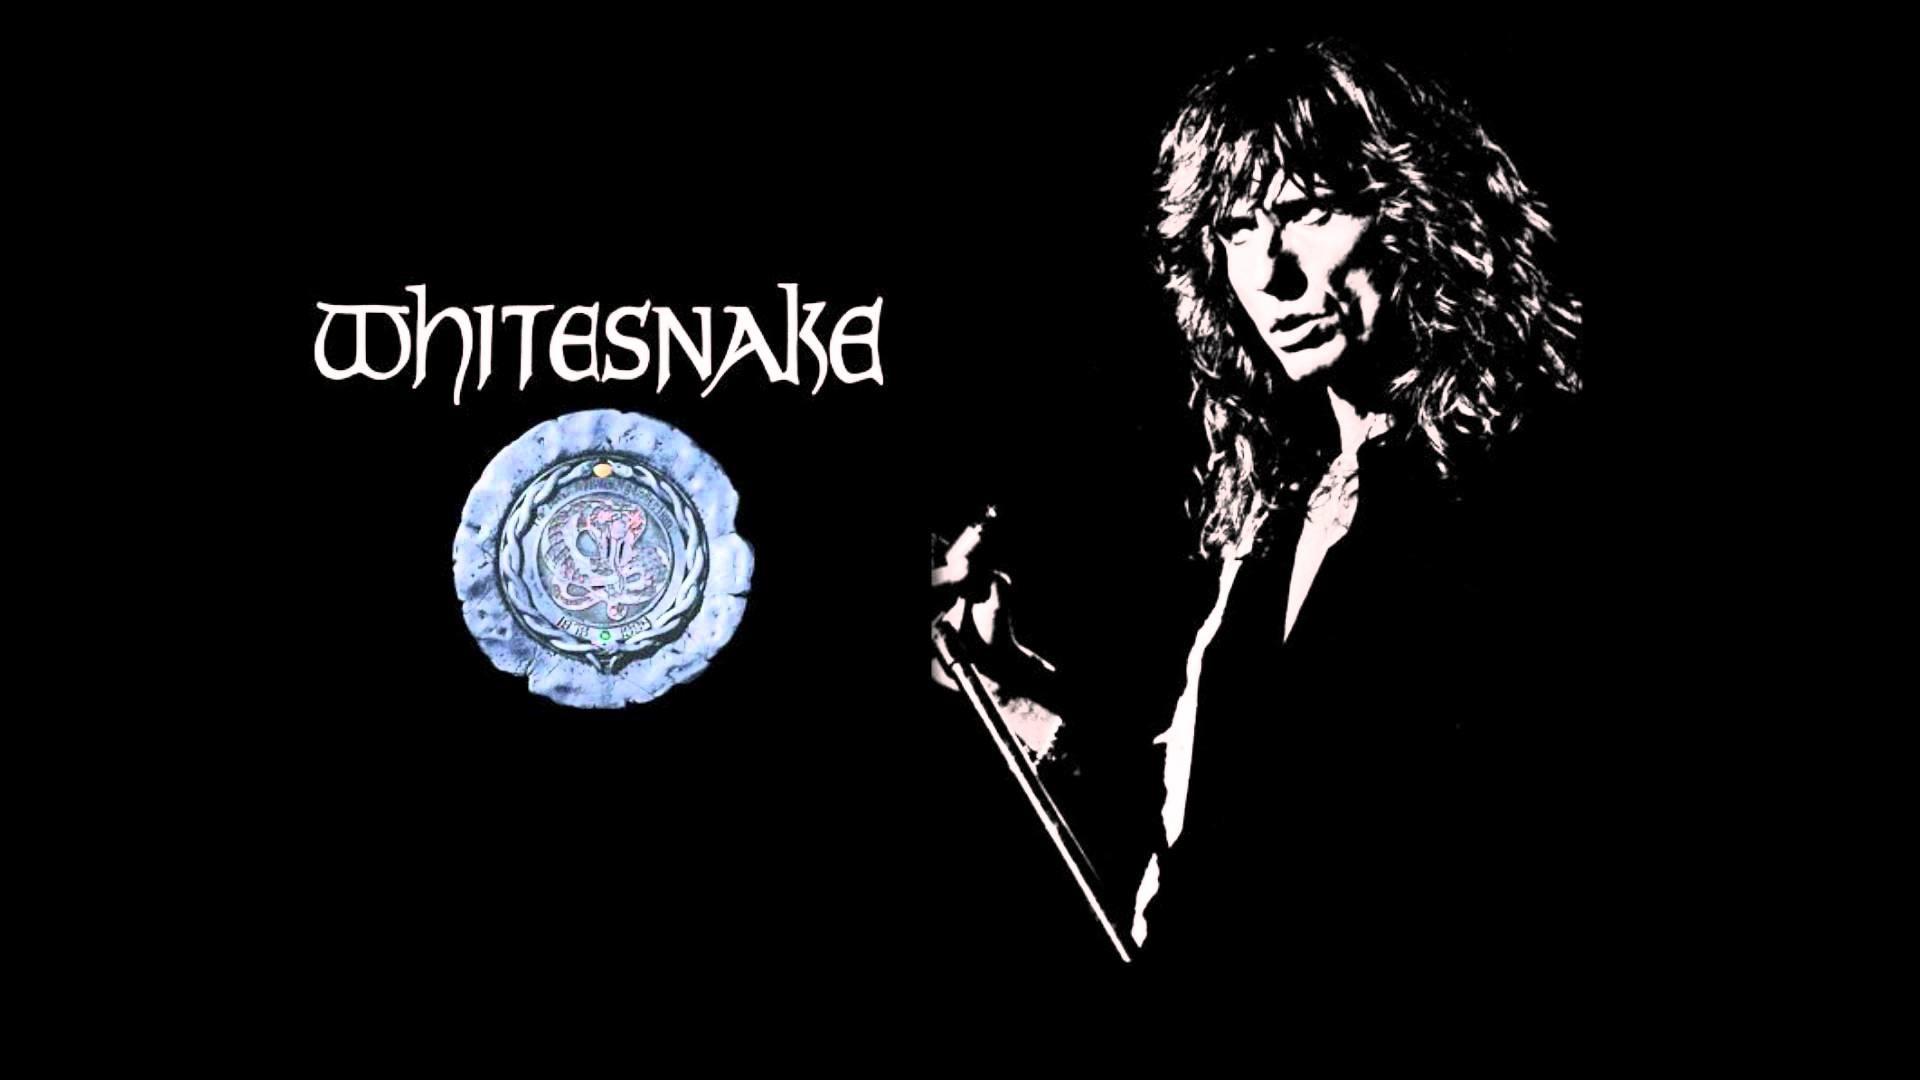 here we go again whitesnake download